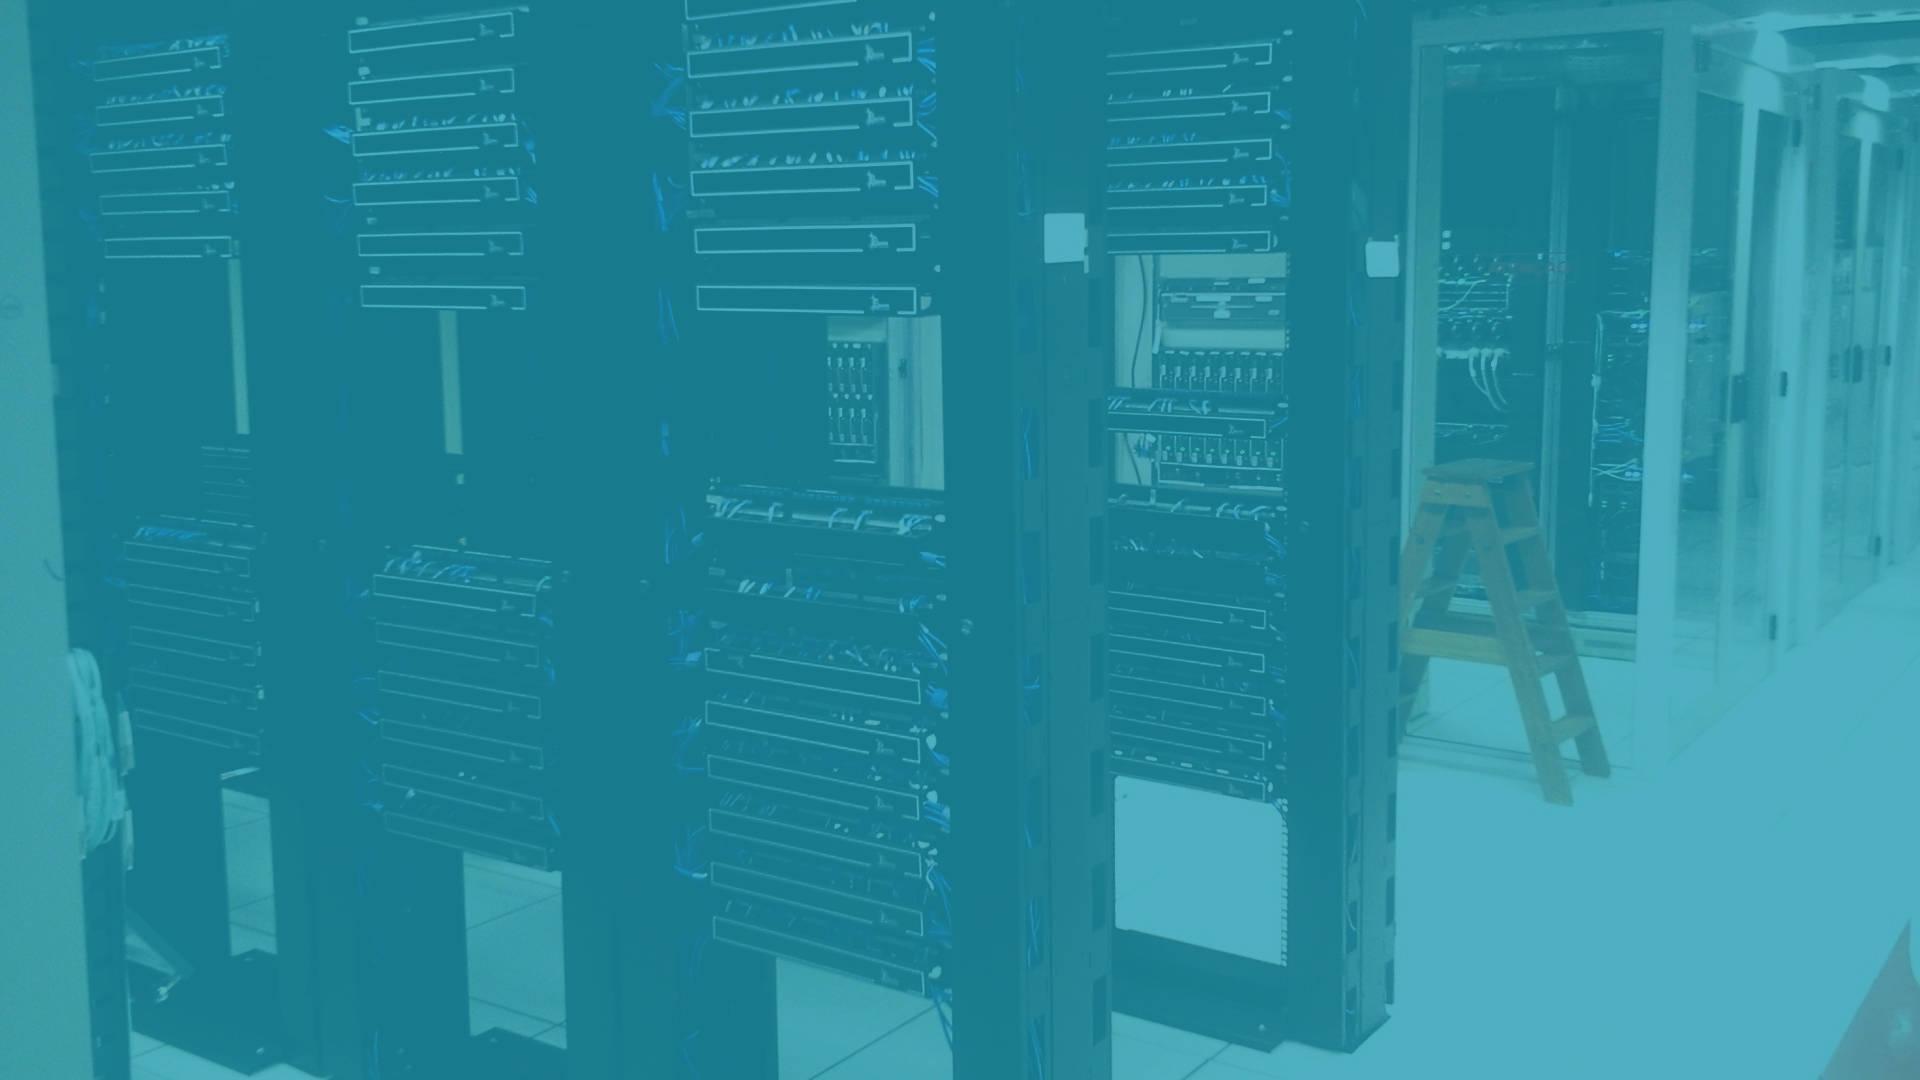 slider-system-computer-engineering